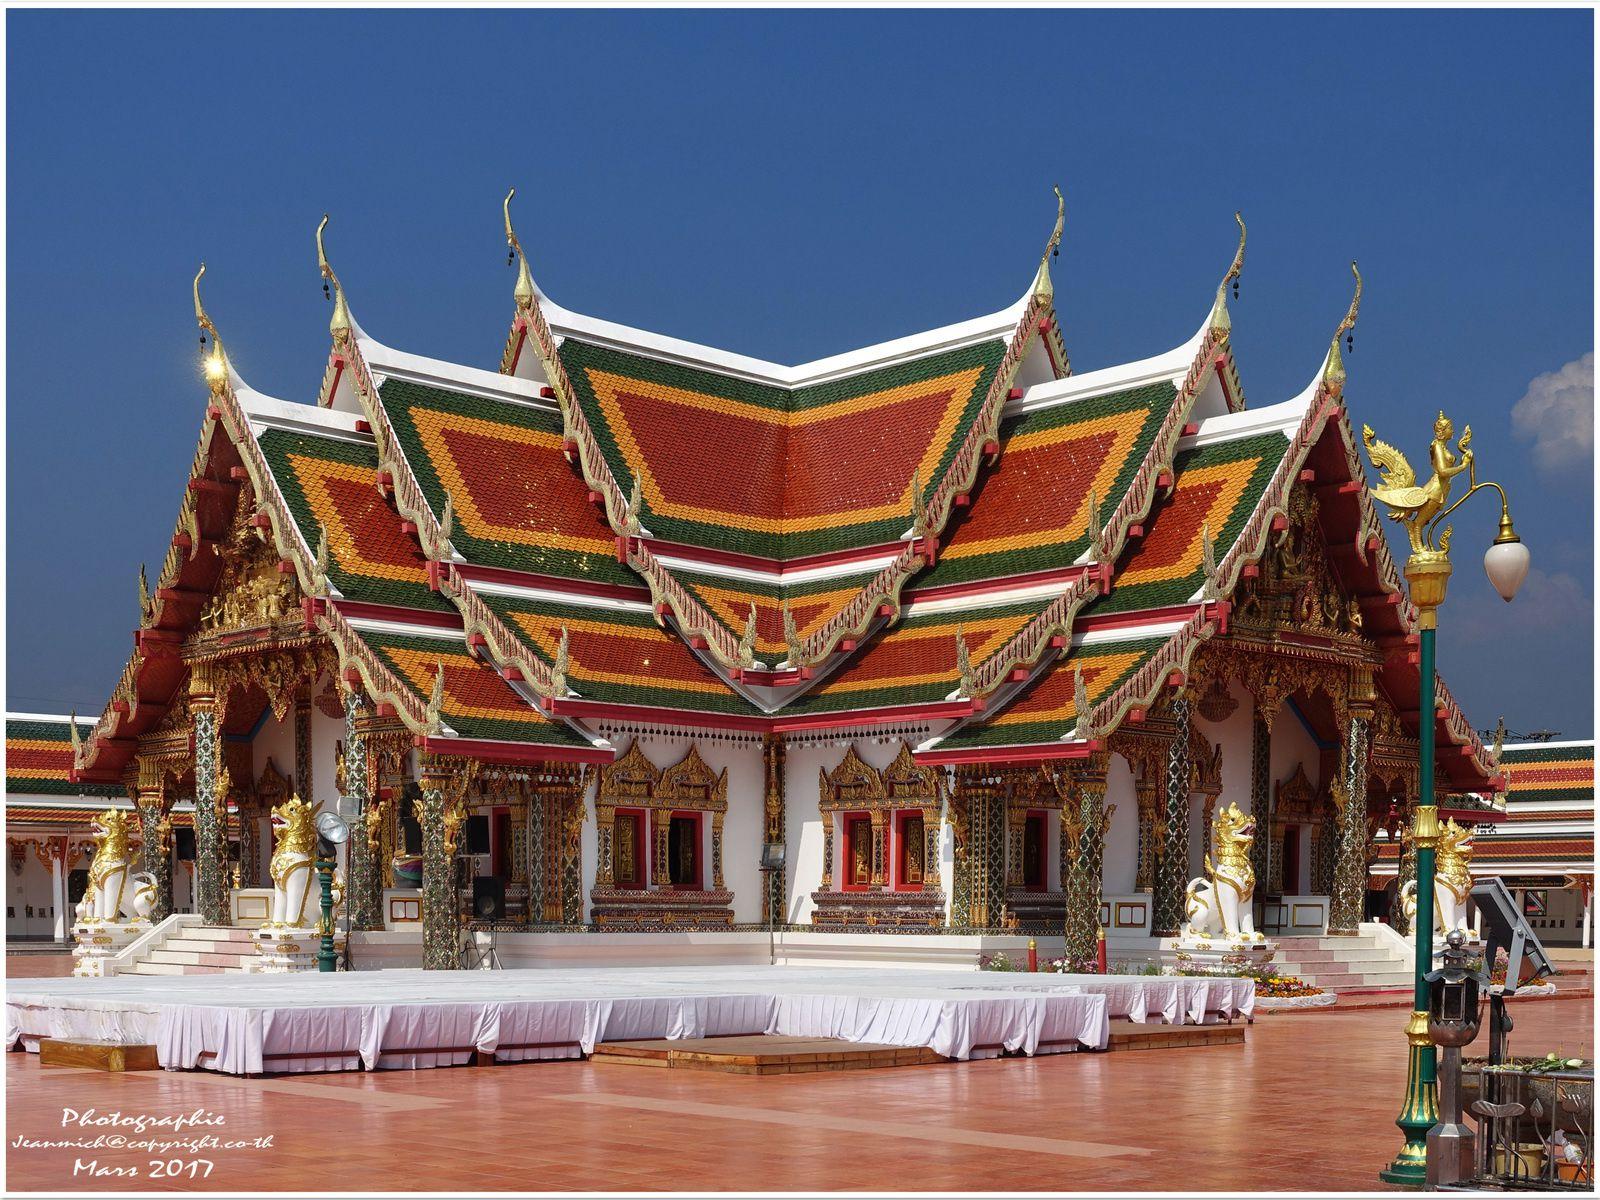 Etape de Sakhon Nakhon (Thaïlande Isaan)  Wat Phra That Choeng Chum Worawihan